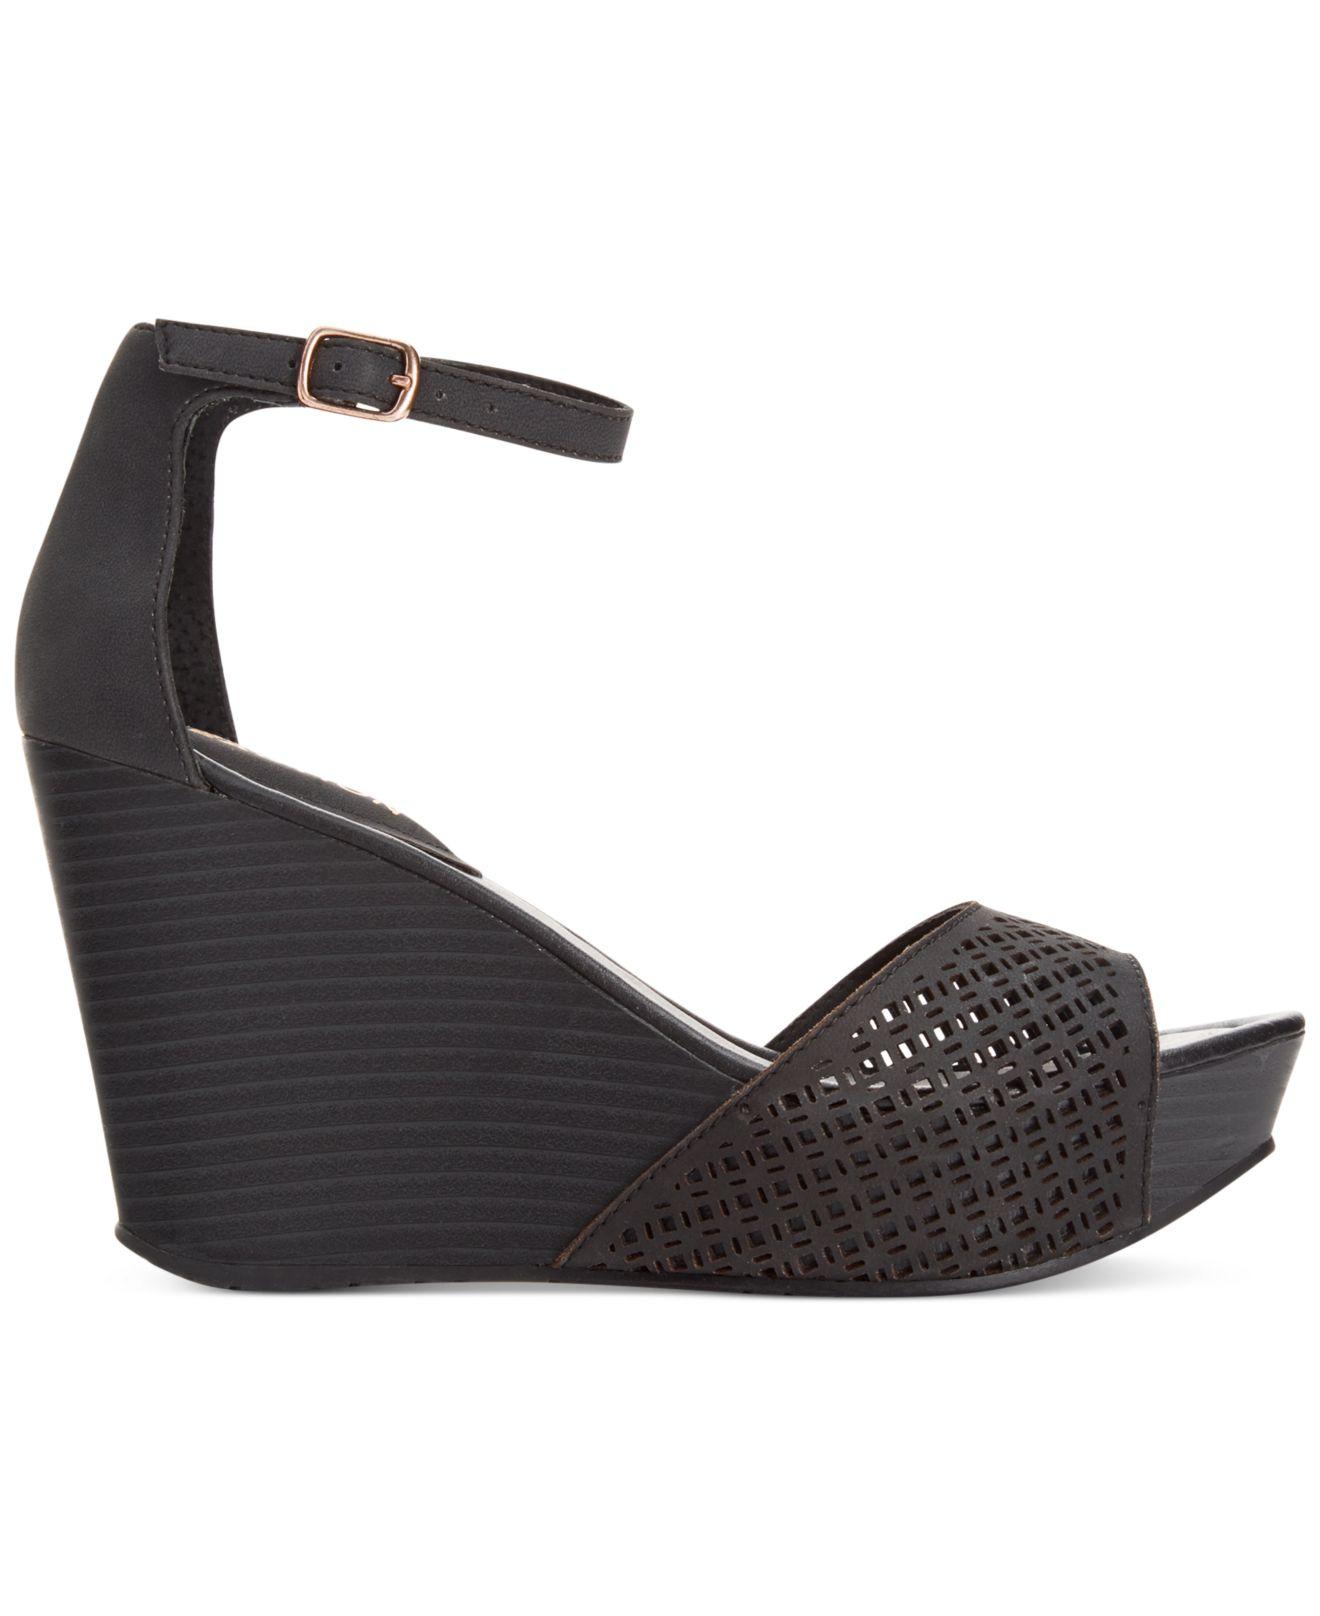 2ecc82b284d Lyst - Kenneth Cole Reaction Sole Ness Platform Wedge Sandals in Black